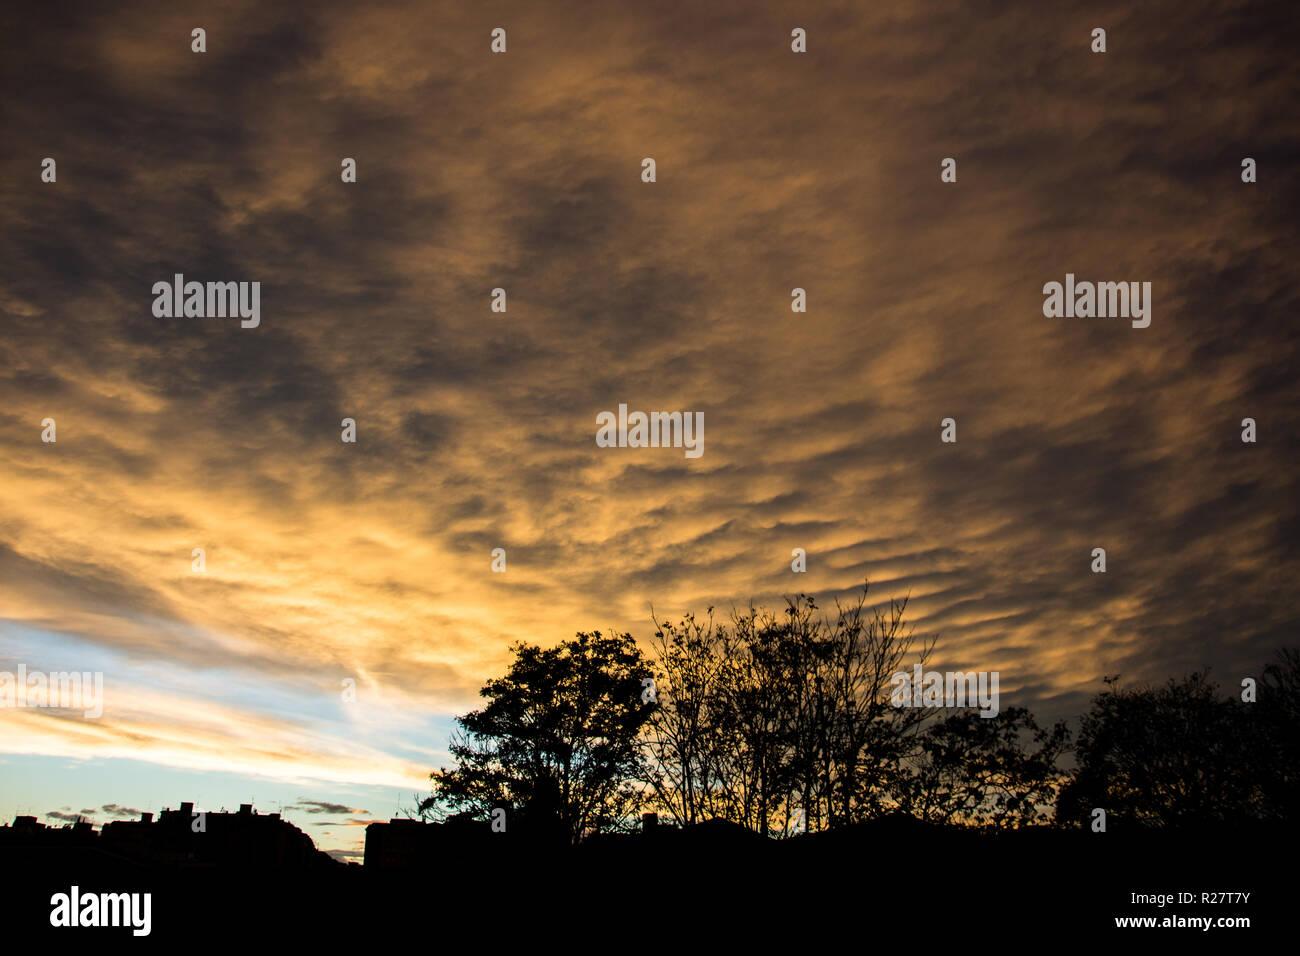 Roman Sunset - Tramonto romano Stock Photo